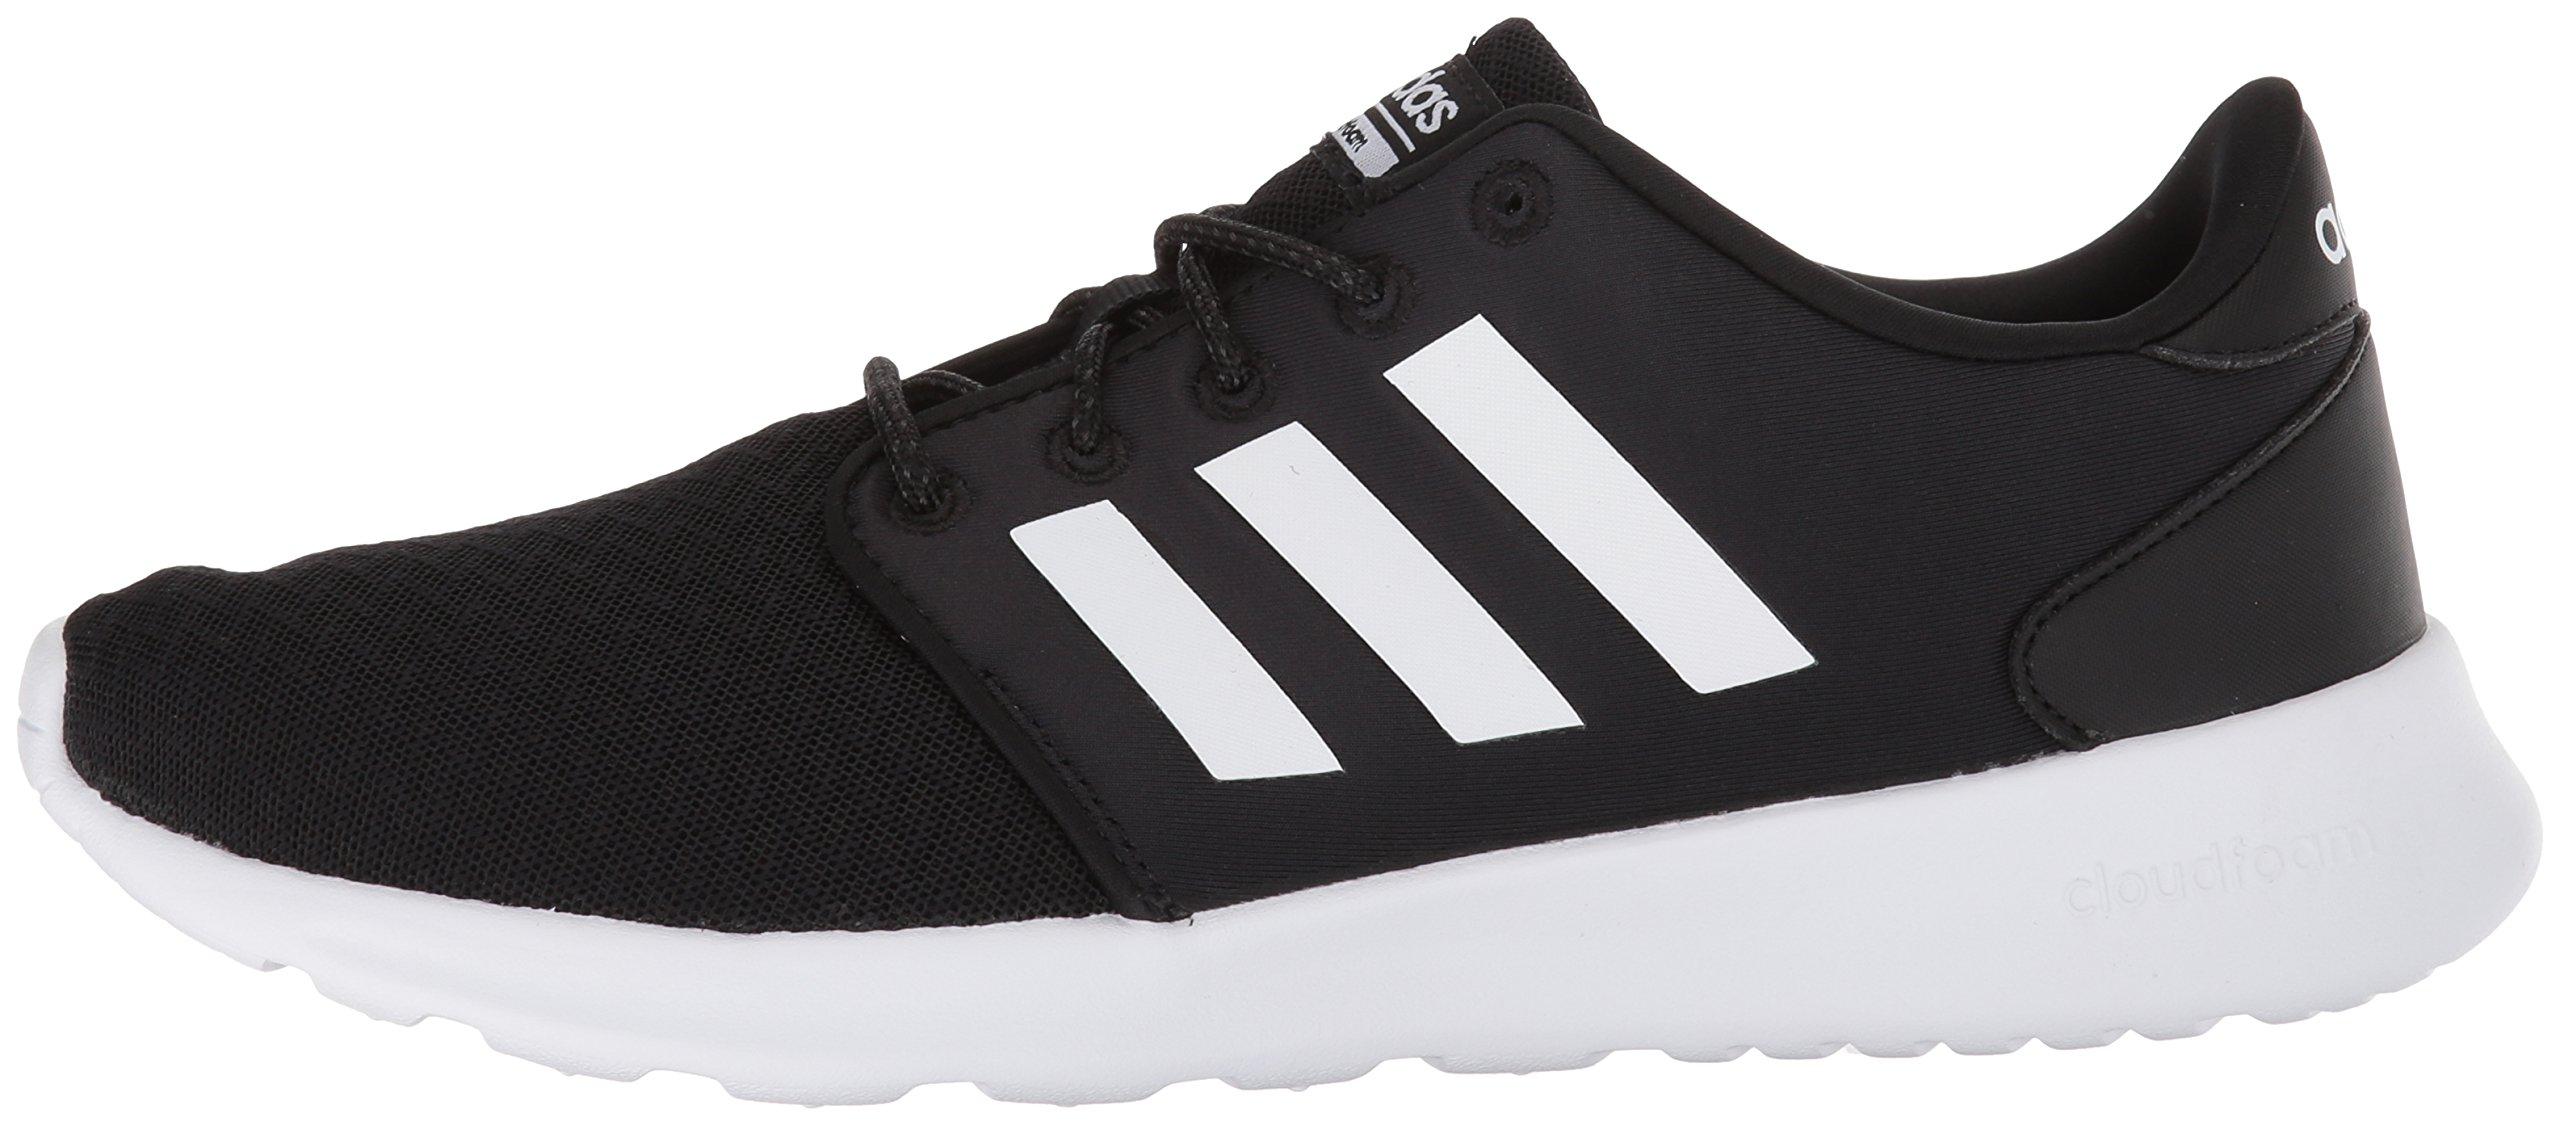 adidas Women's Cloudfoam QT Racer Running Shoe, Black/White/Carbon, 5 M US by adidas (Image #5)